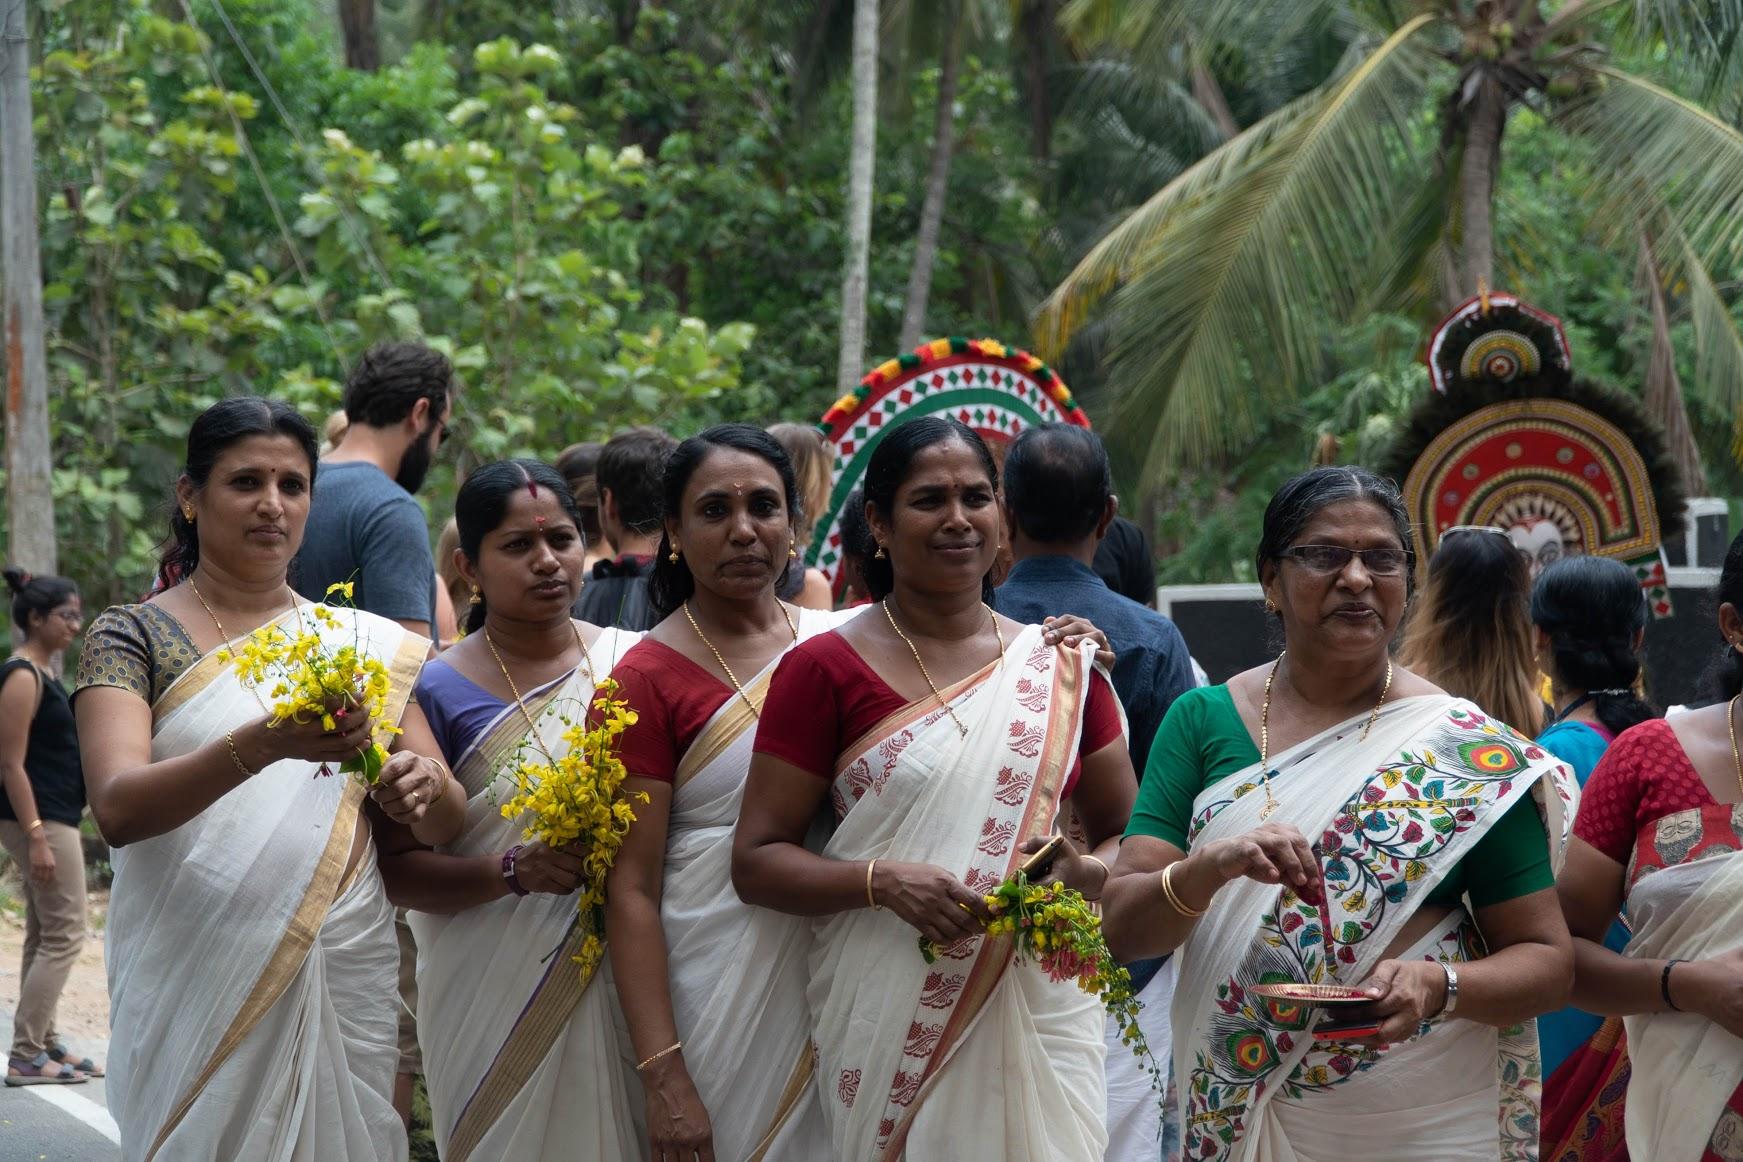 Sari Indiano roupa típica Índia